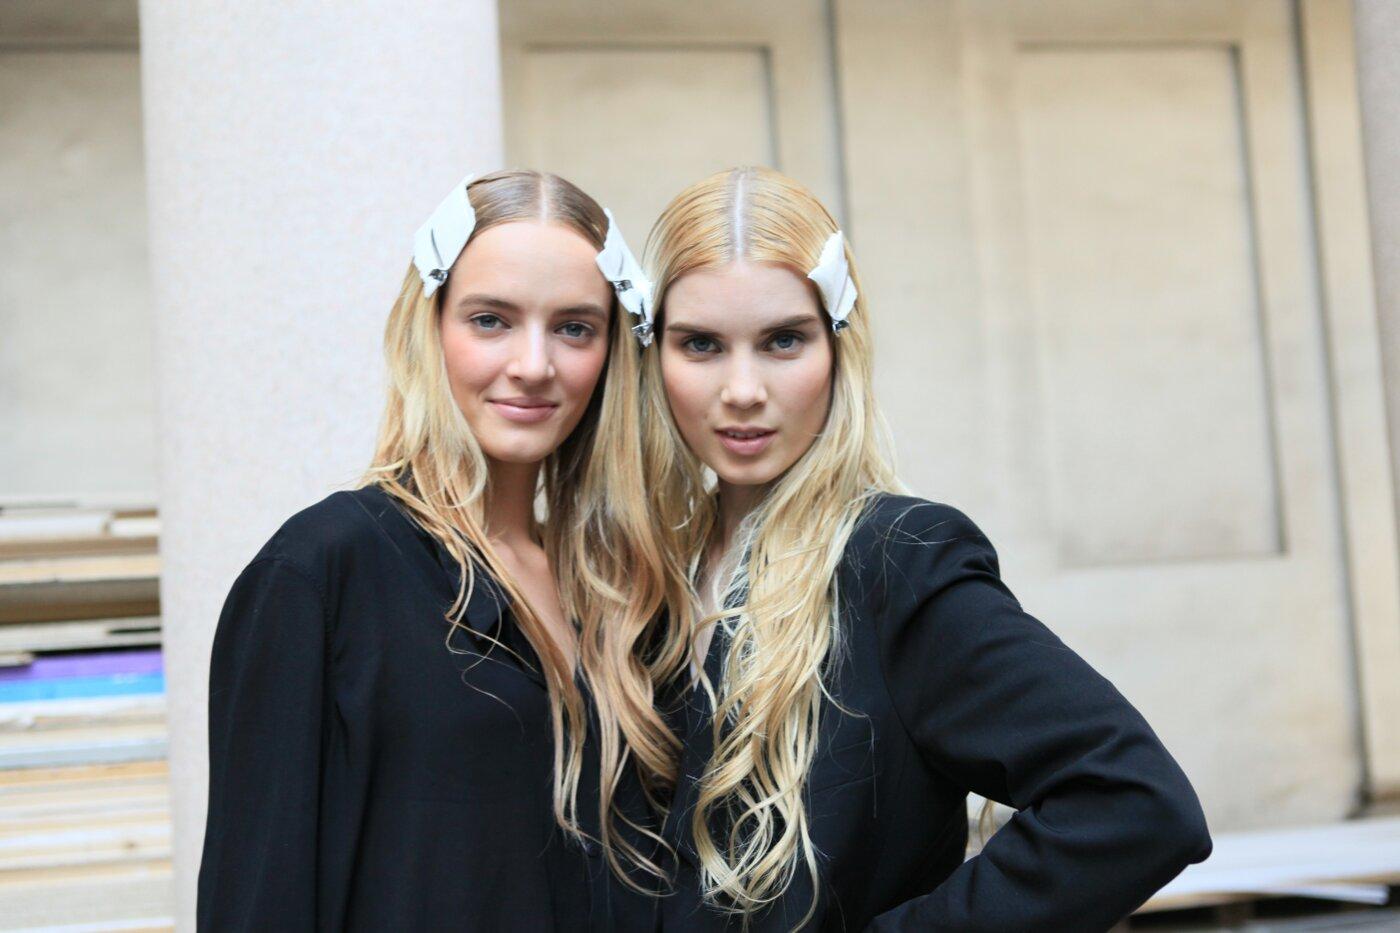 Backstage Alberta Ferretti Spring Summer 2012 Women Fashion Show